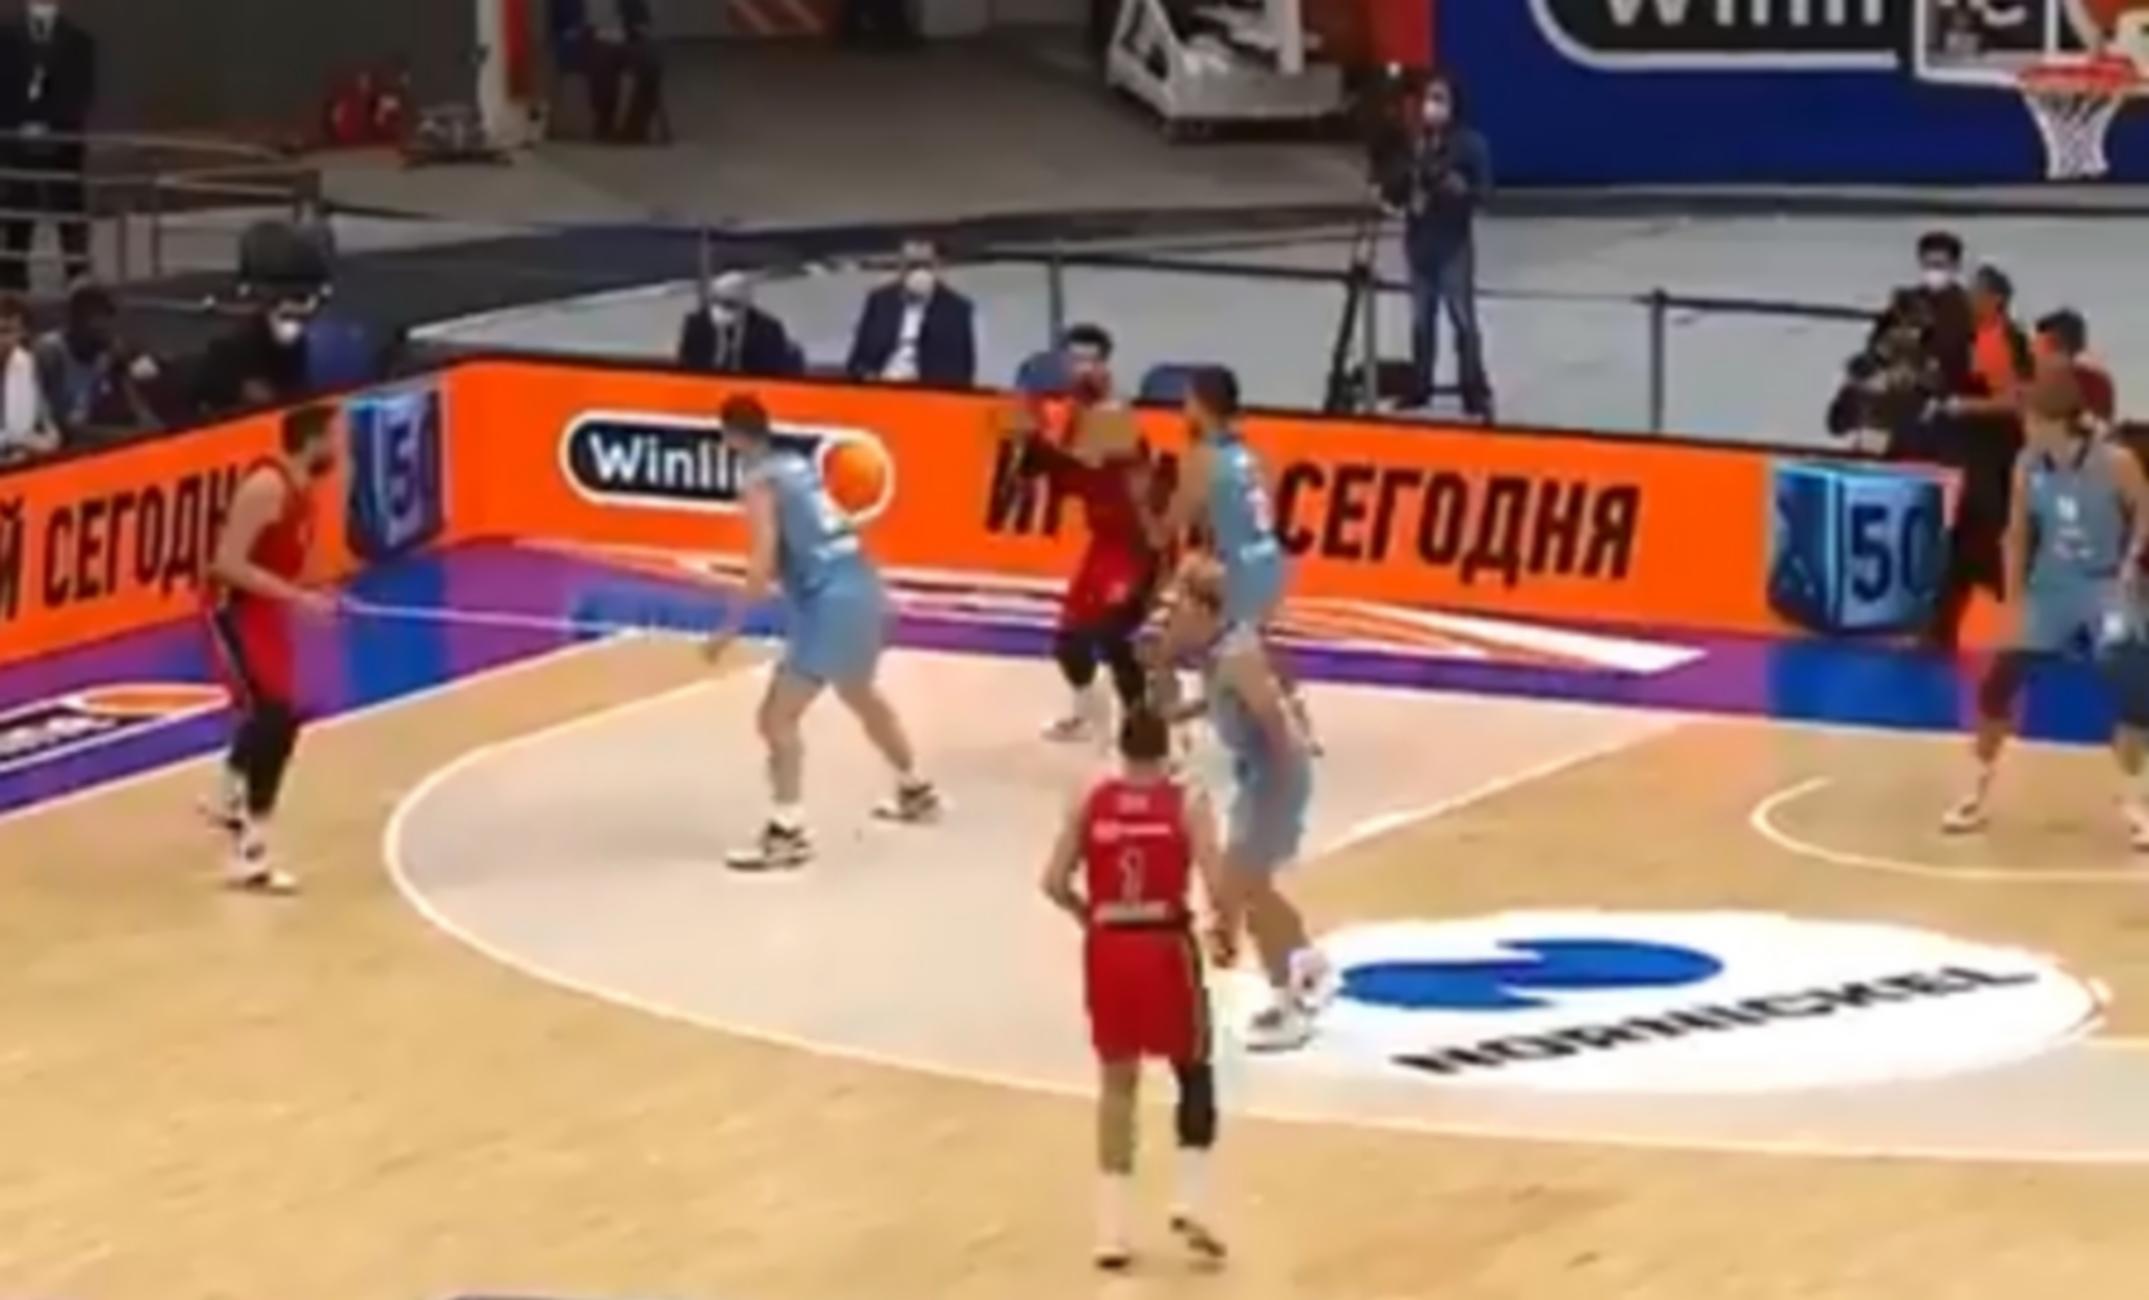 Euroleague, ΤΣΣΚΑ Μόσχας – Ζενίτ Αγίας Πετρούπολης 77-67: Τρομερός Σενγκέλια «καθάρισε» το ρωσικό ντέρμπι με ρεκόρ καριέρας